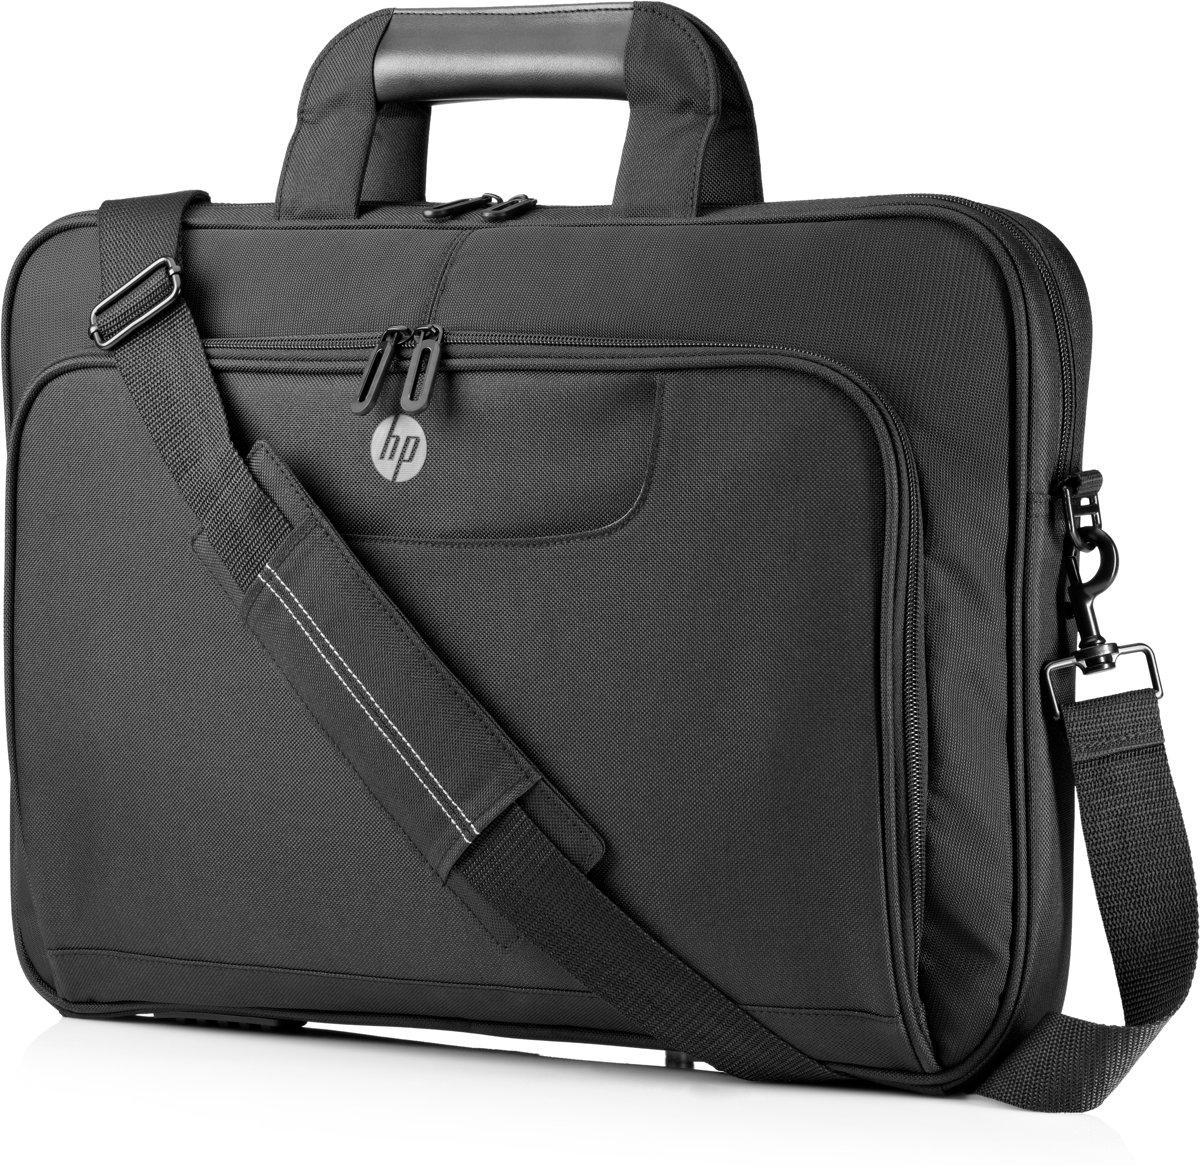 bd024c3a35b bol.com | HP Laptoptas kopen? Alle Laptoptassen online